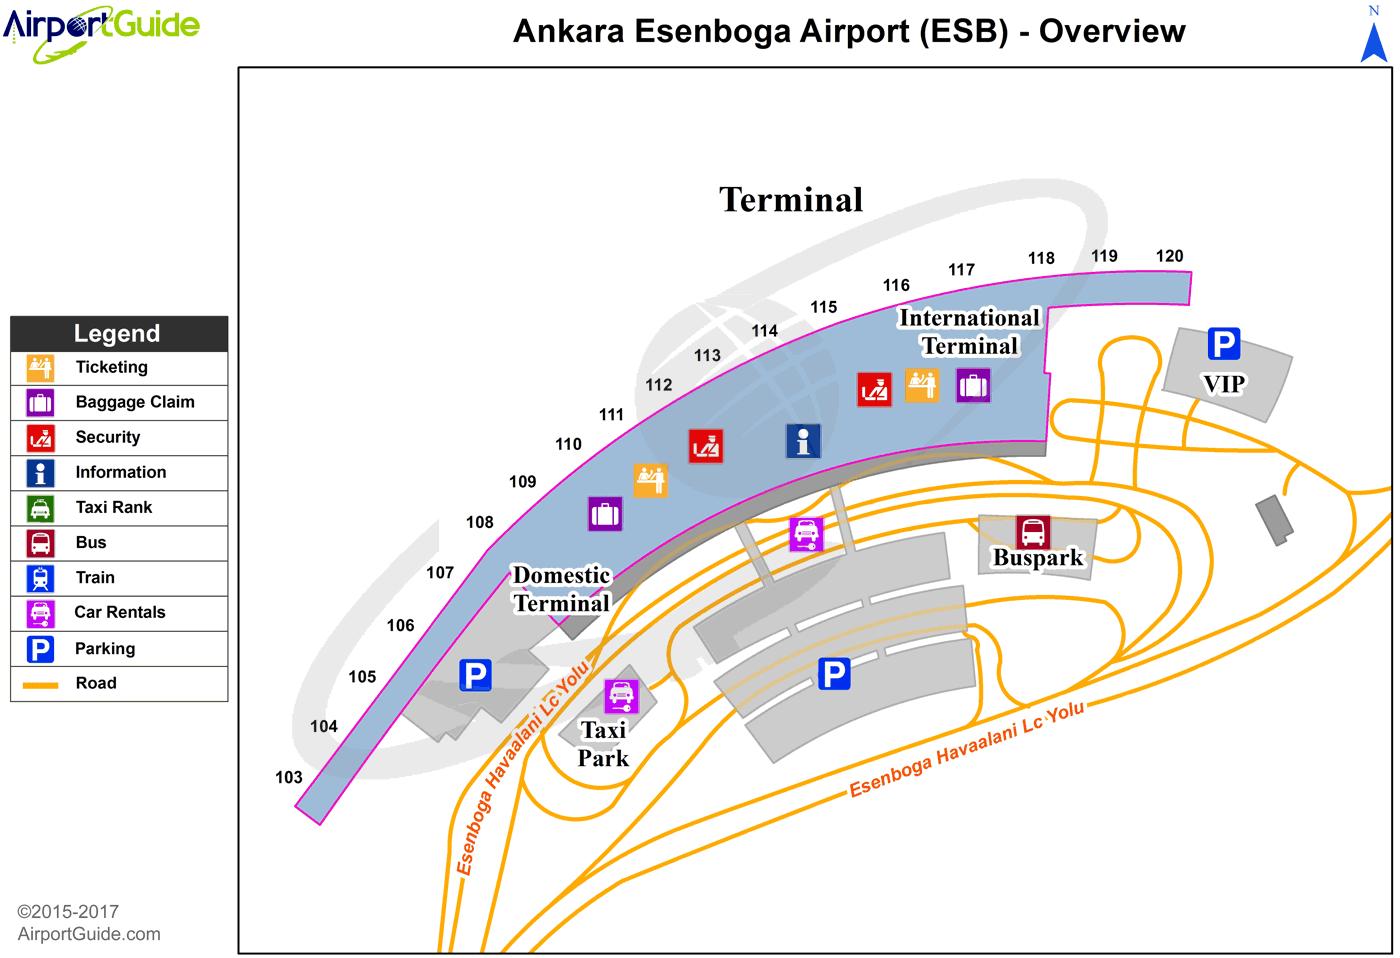 ankara - esenboğa international (esb) airport terminal map